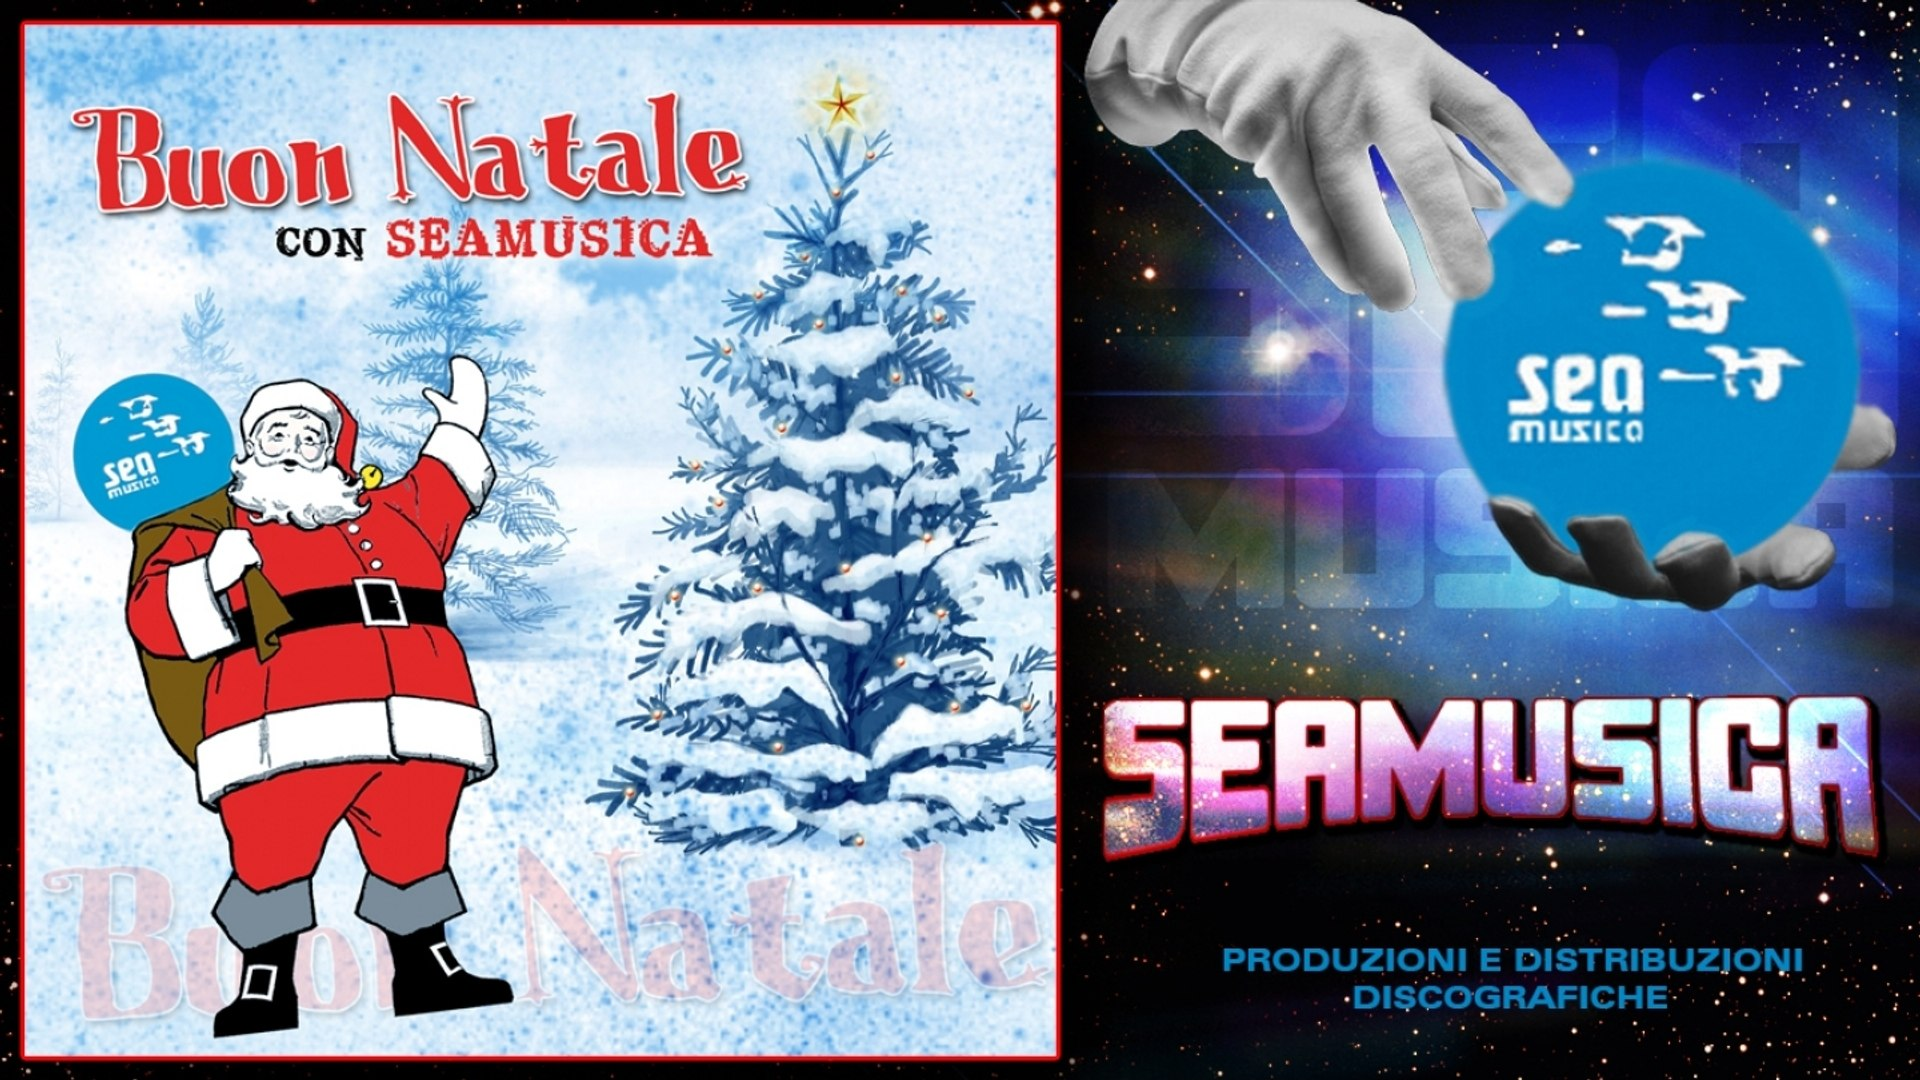 Angelo Cavallaro Buon Natale.Artisti Vari Buon Natale Con Seamusica Video Dailymotion